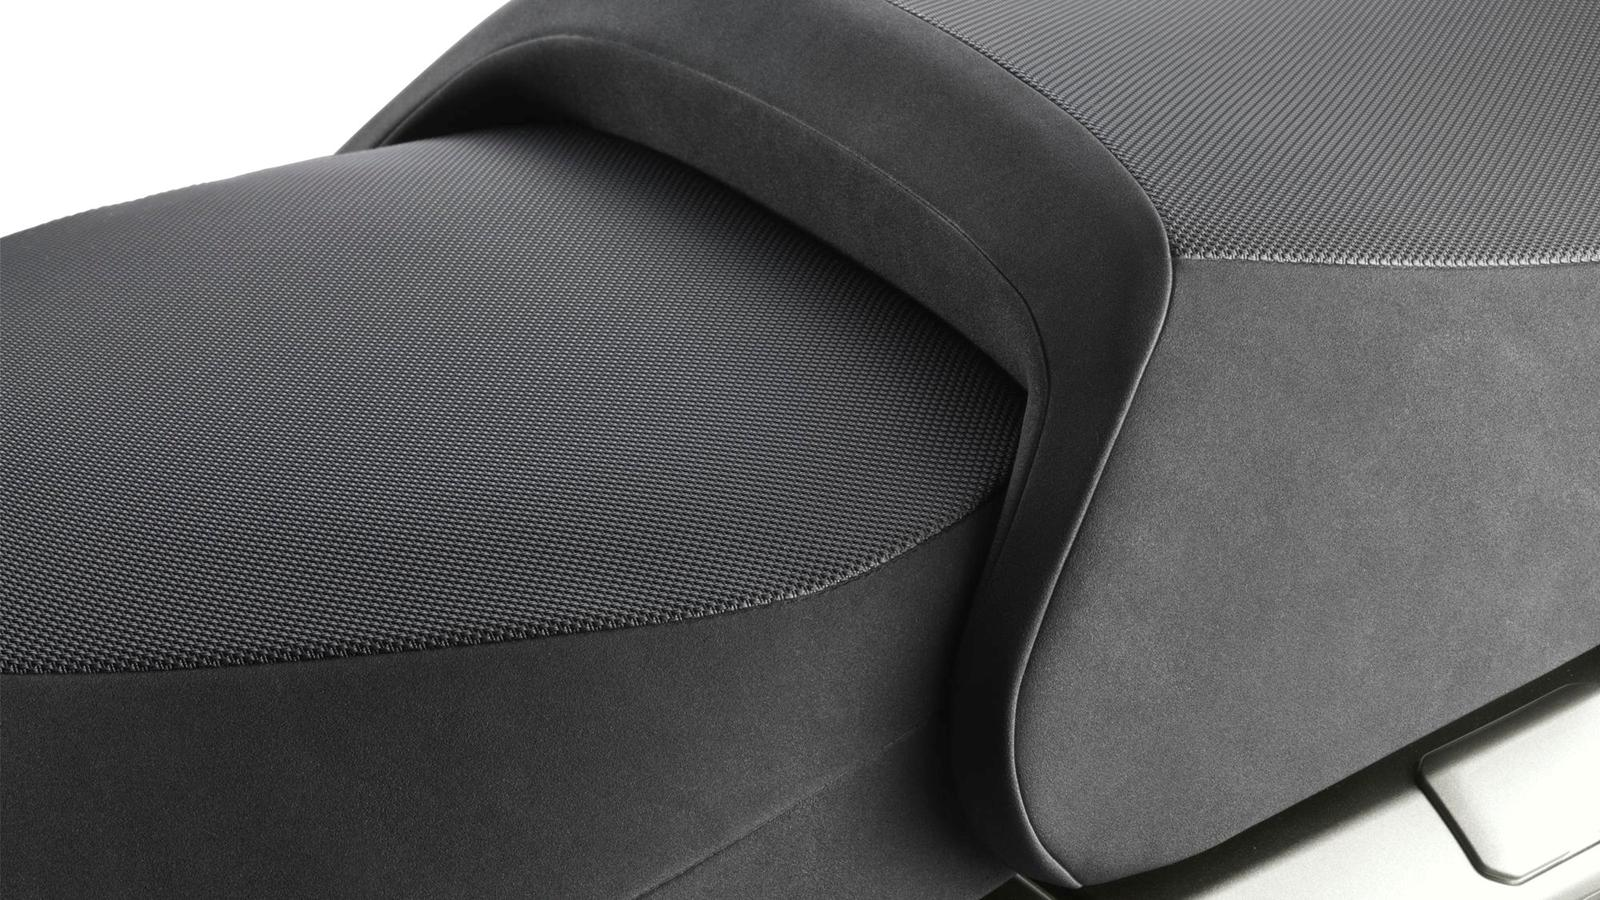 2013-FJR1300A-EU-Frosted-Blade-Detail-002-osob